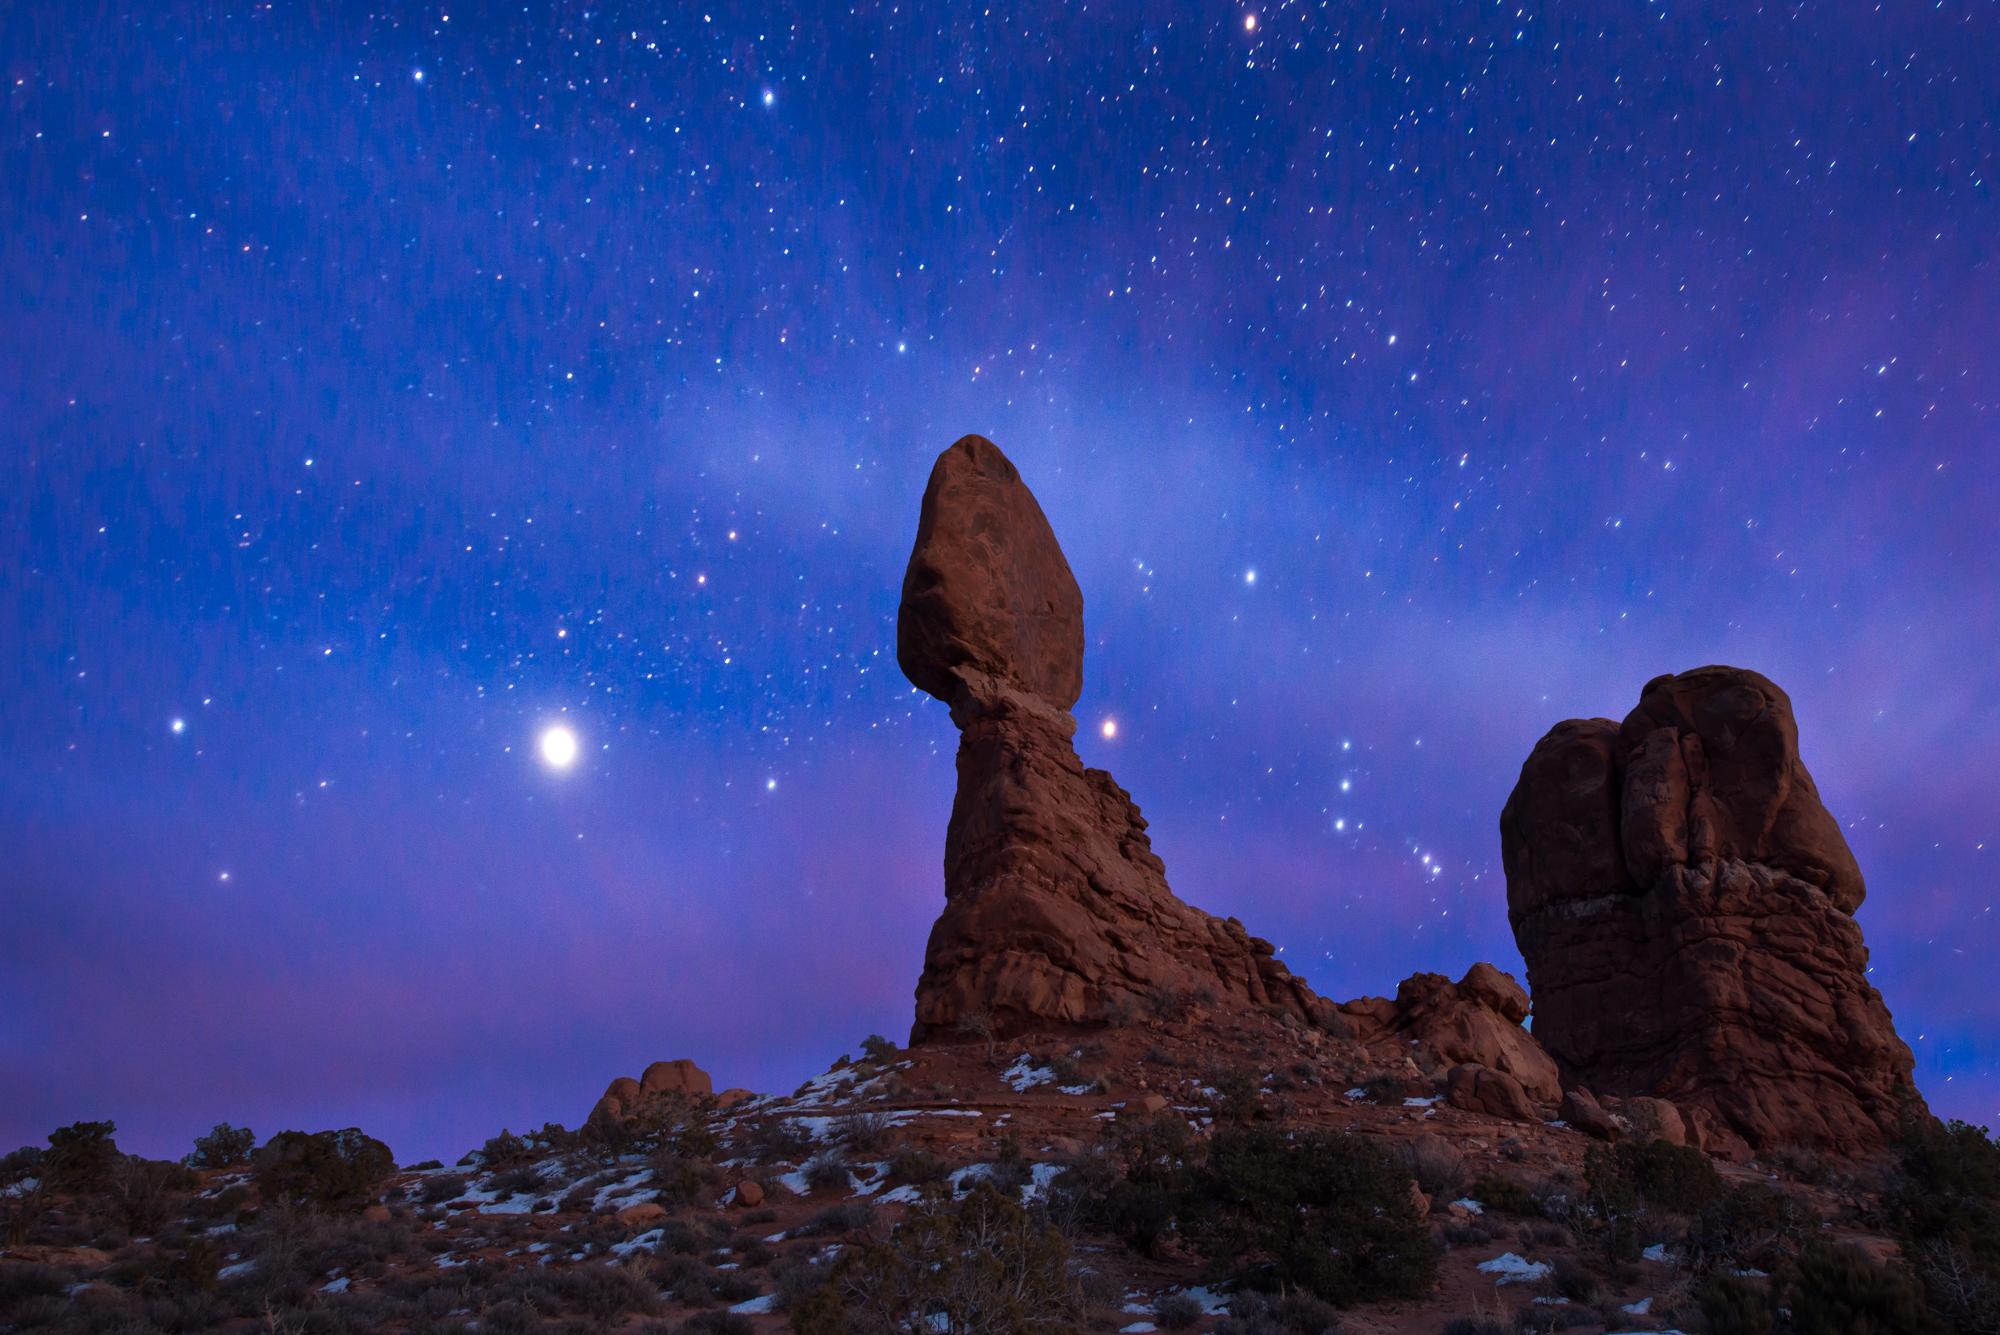 Star Gazing, Balanced Rock, Arches National Park